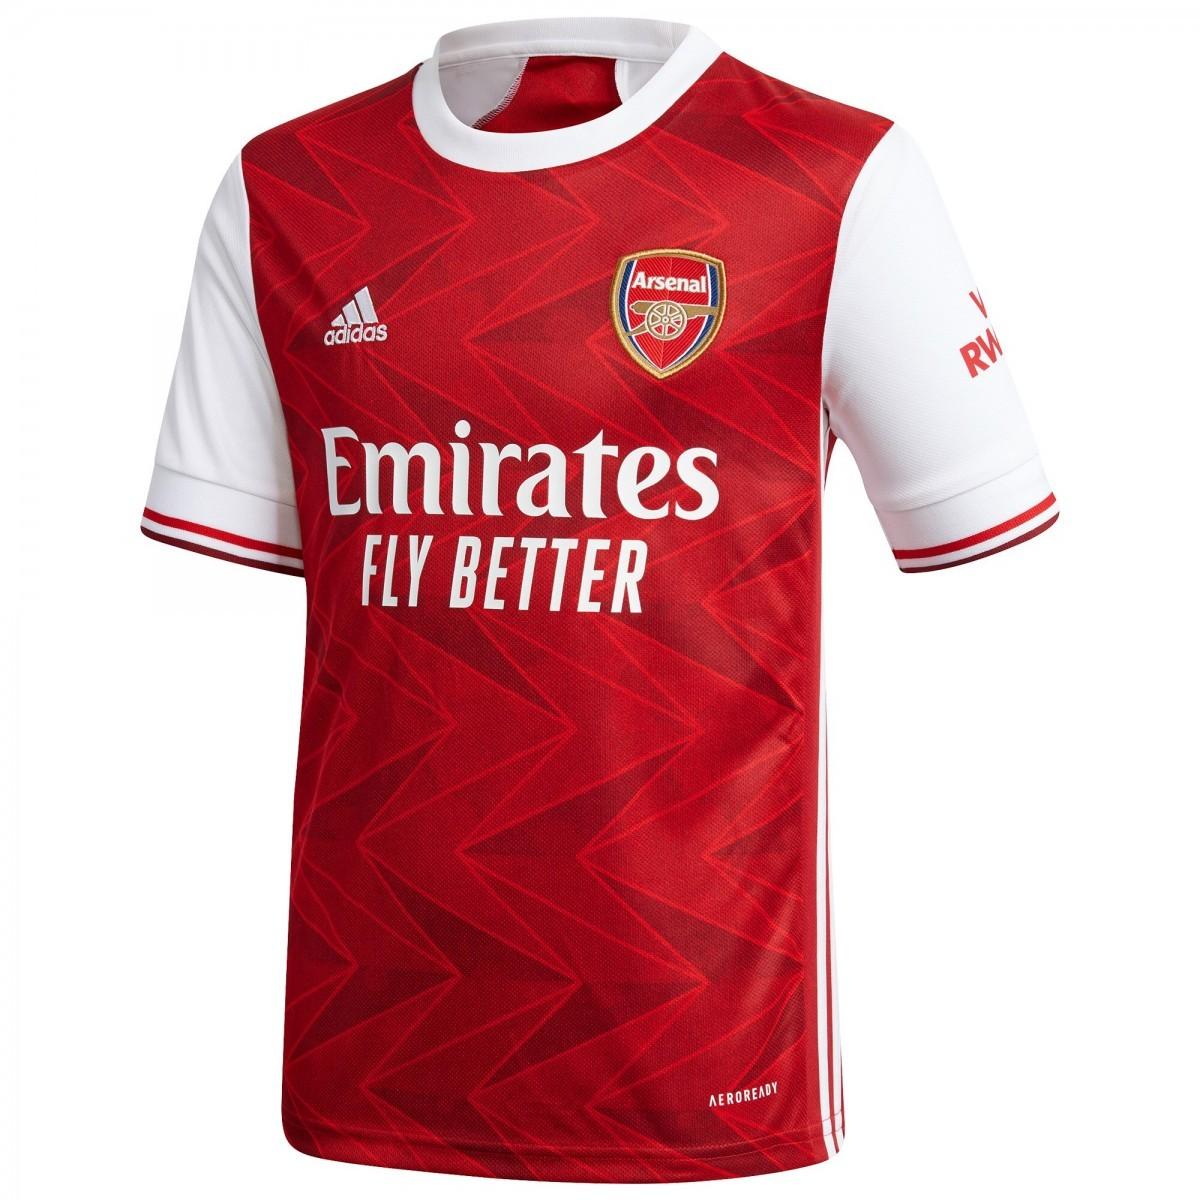 Camisa Arsenal Home Adidas 2020-21 Infantil